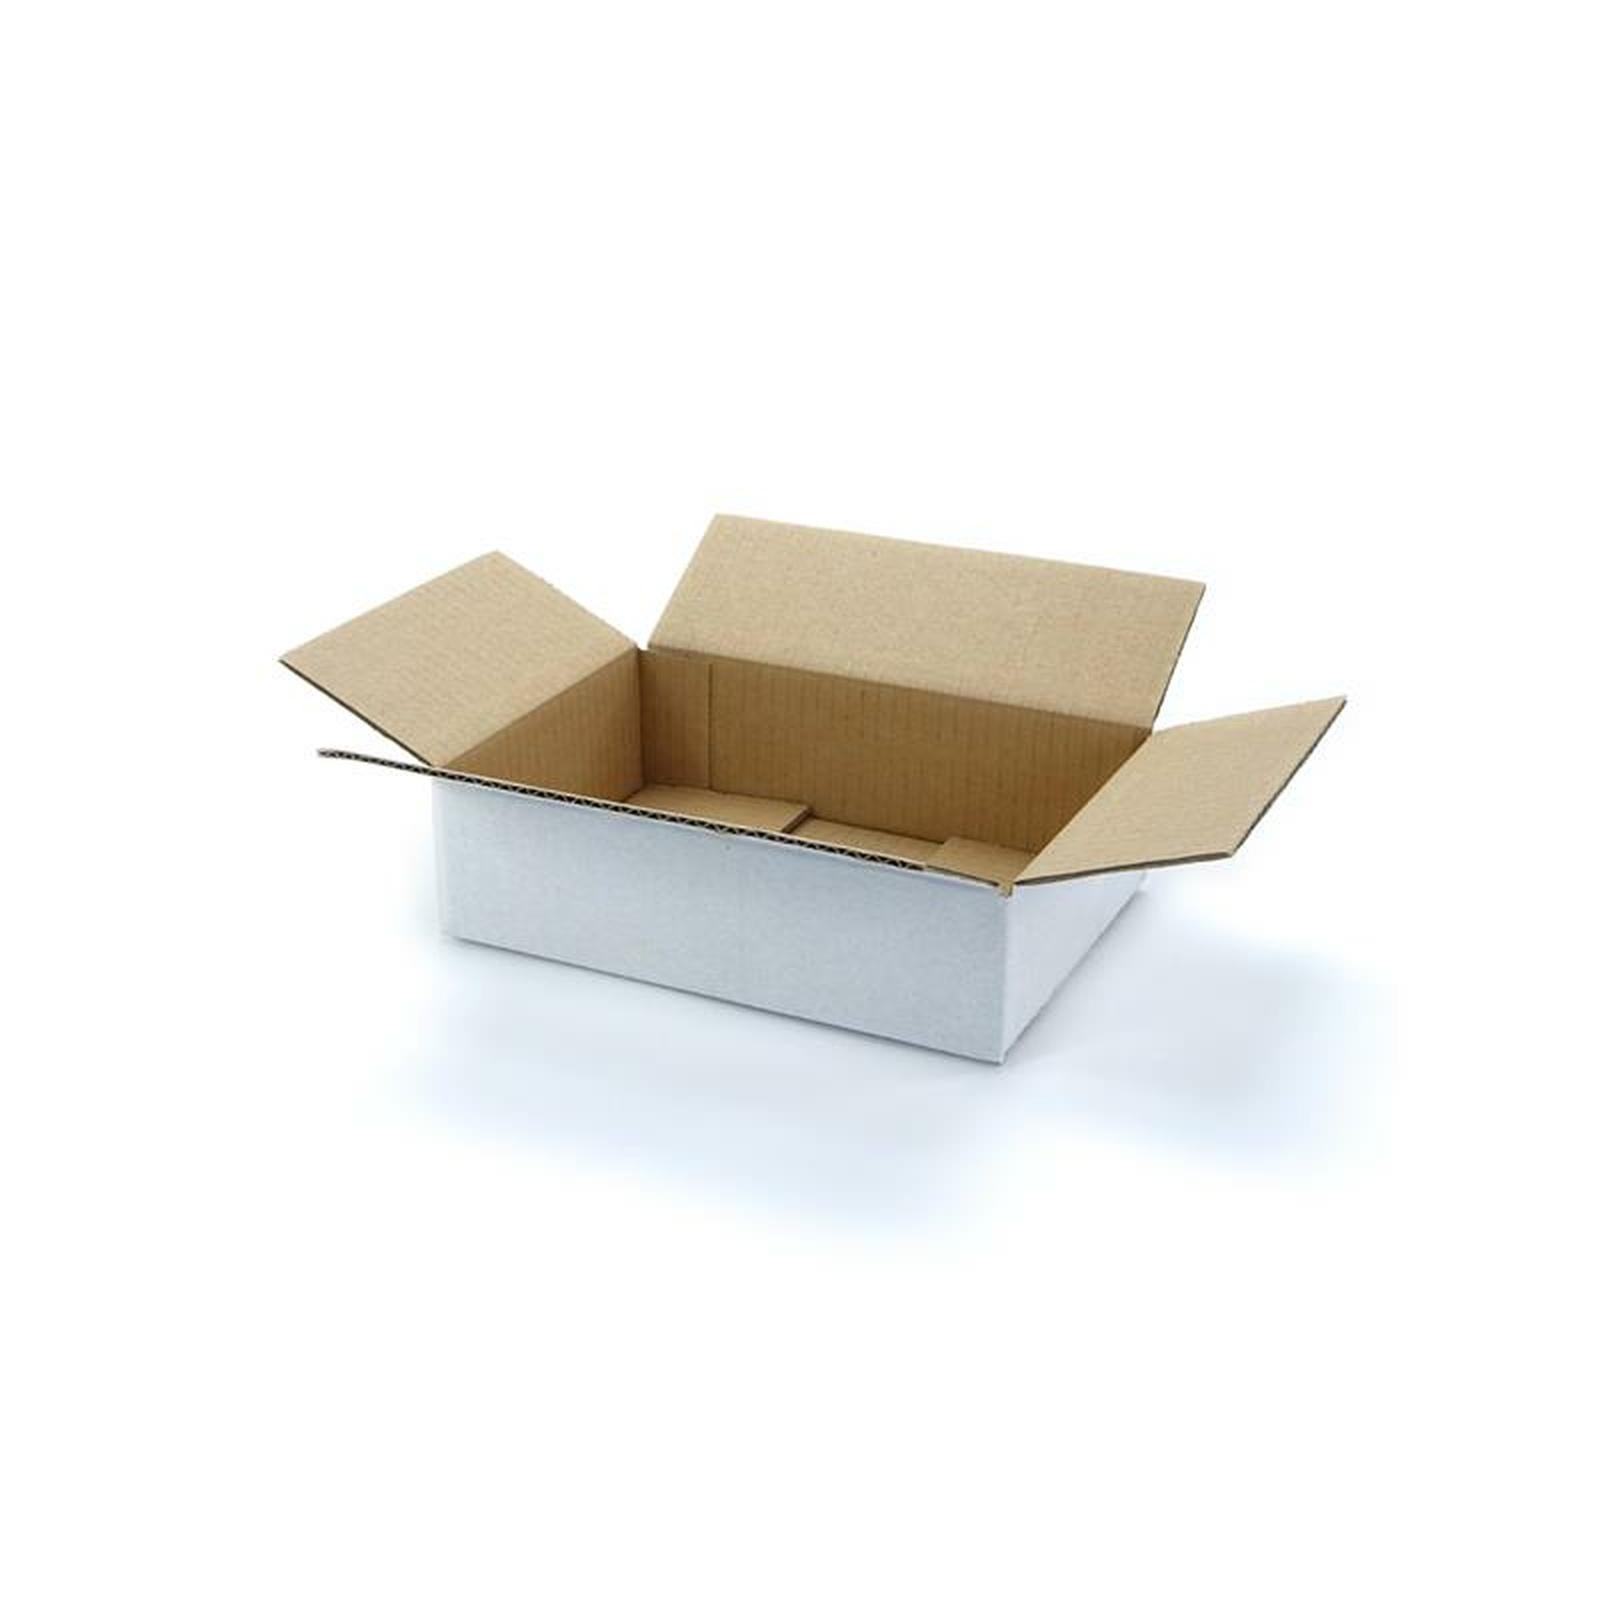 einwellige kartons 215x150x55 mm g nstig kaufen 0 18. Black Bedroom Furniture Sets. Home Design Ideas